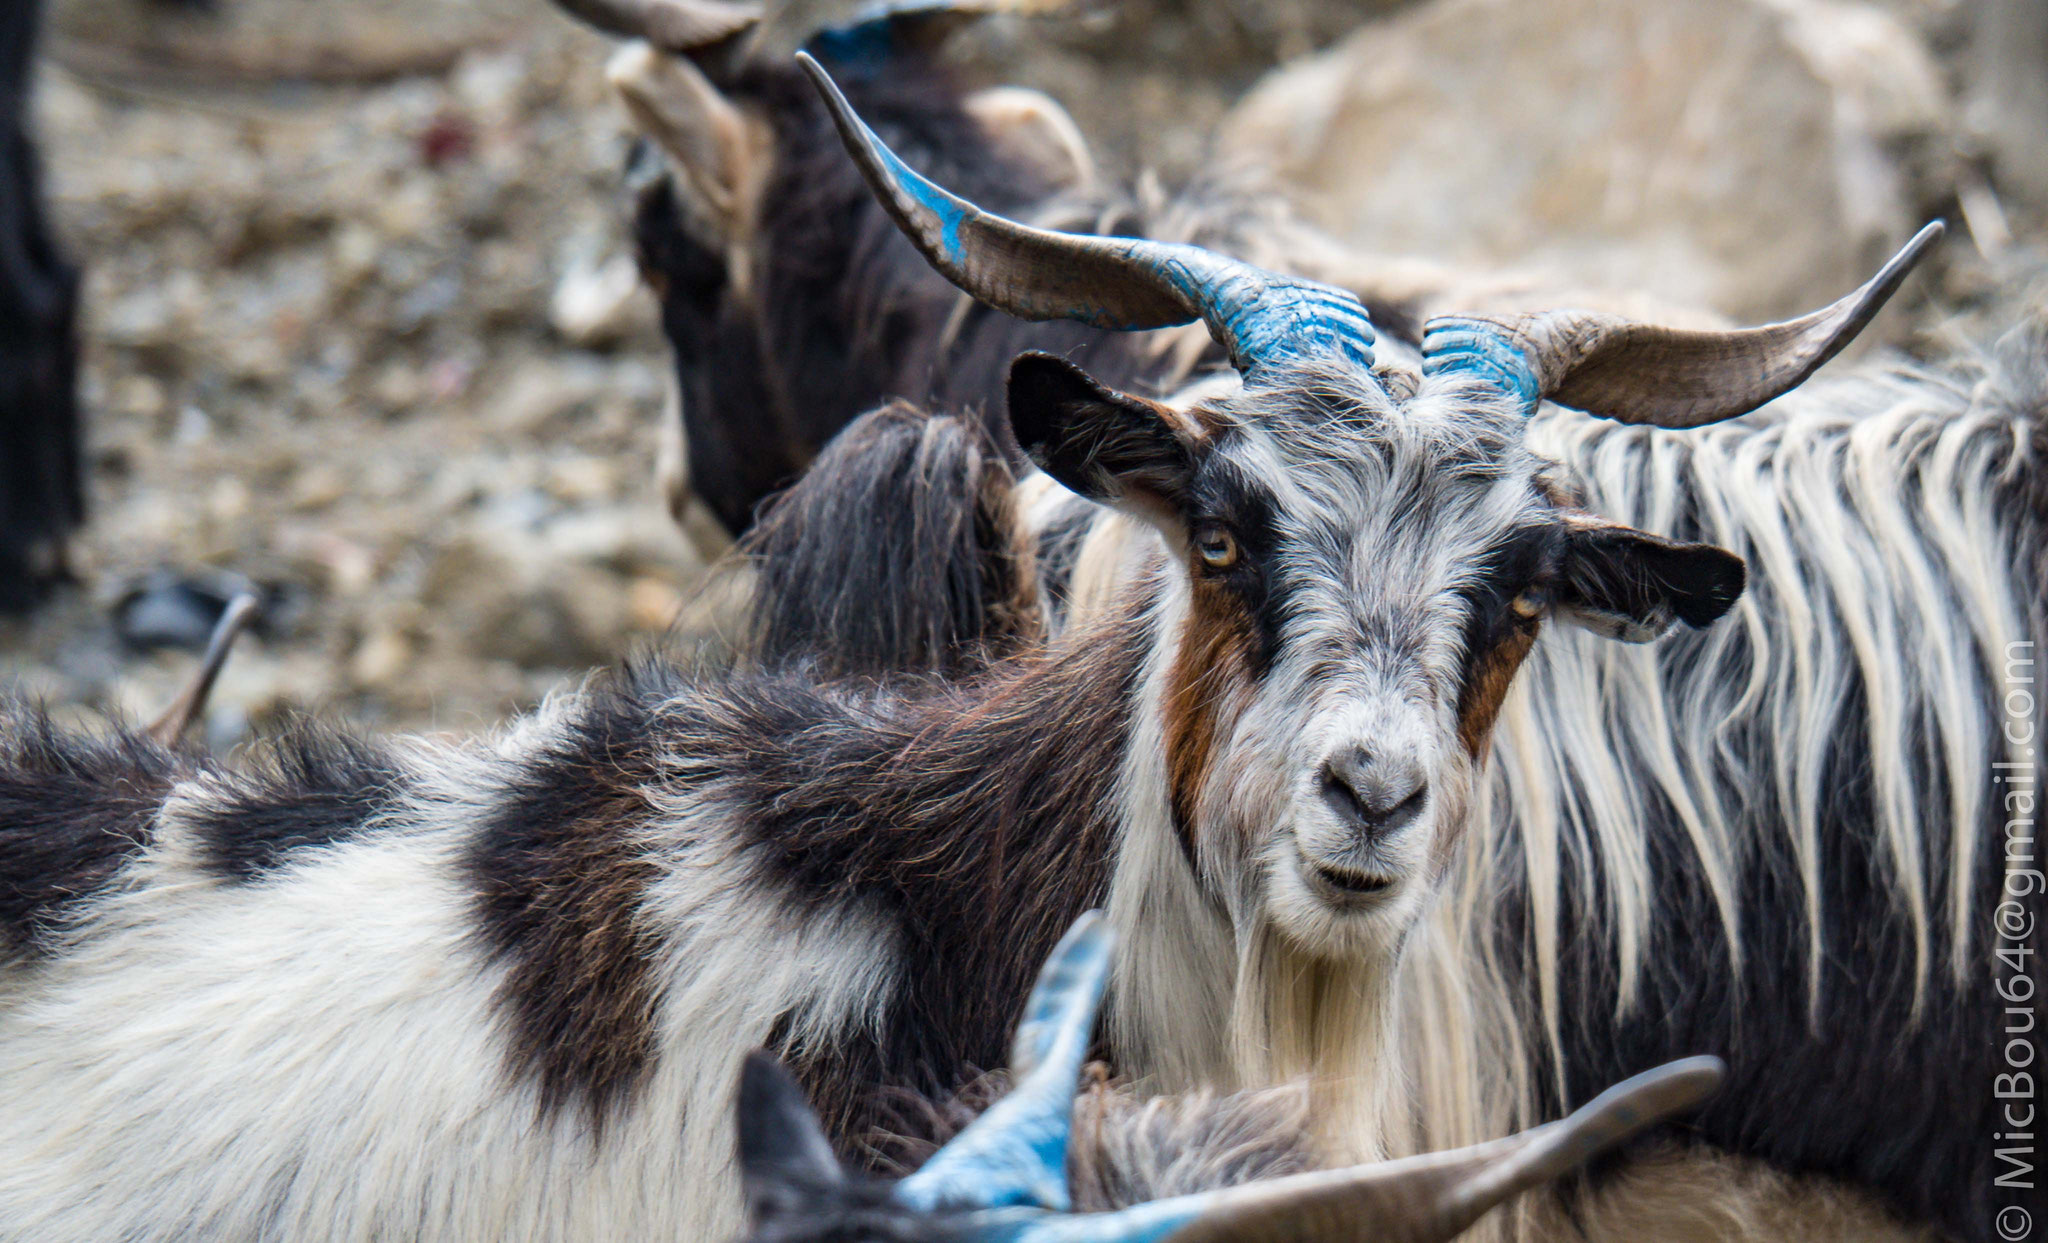 Ziegen in Nepal